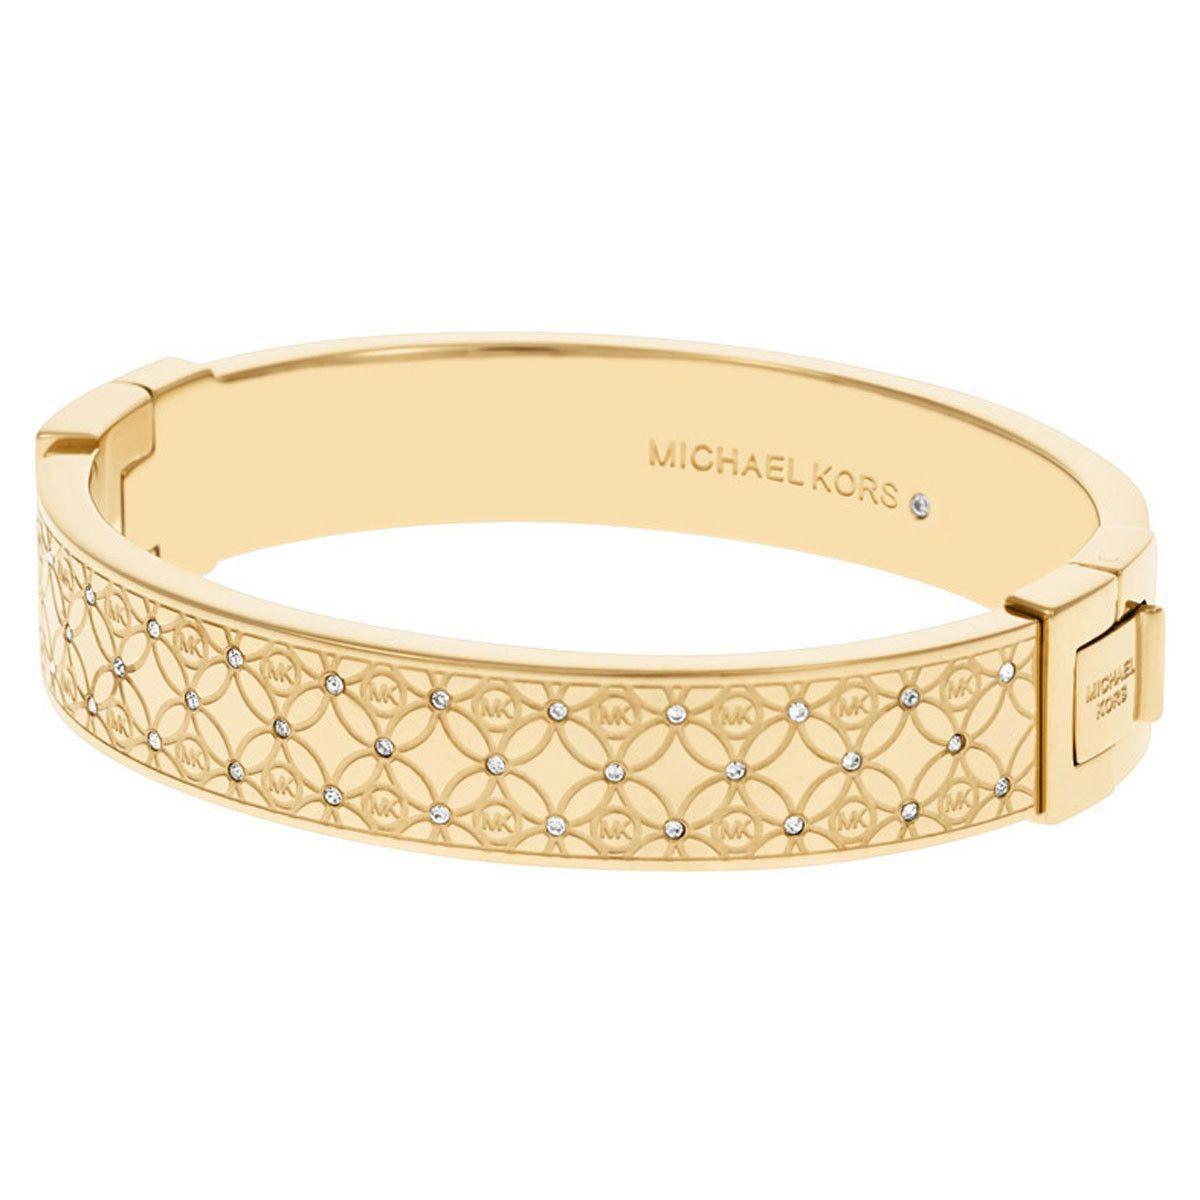 Michael kors mkj womenus monogram gold tone steel crystal